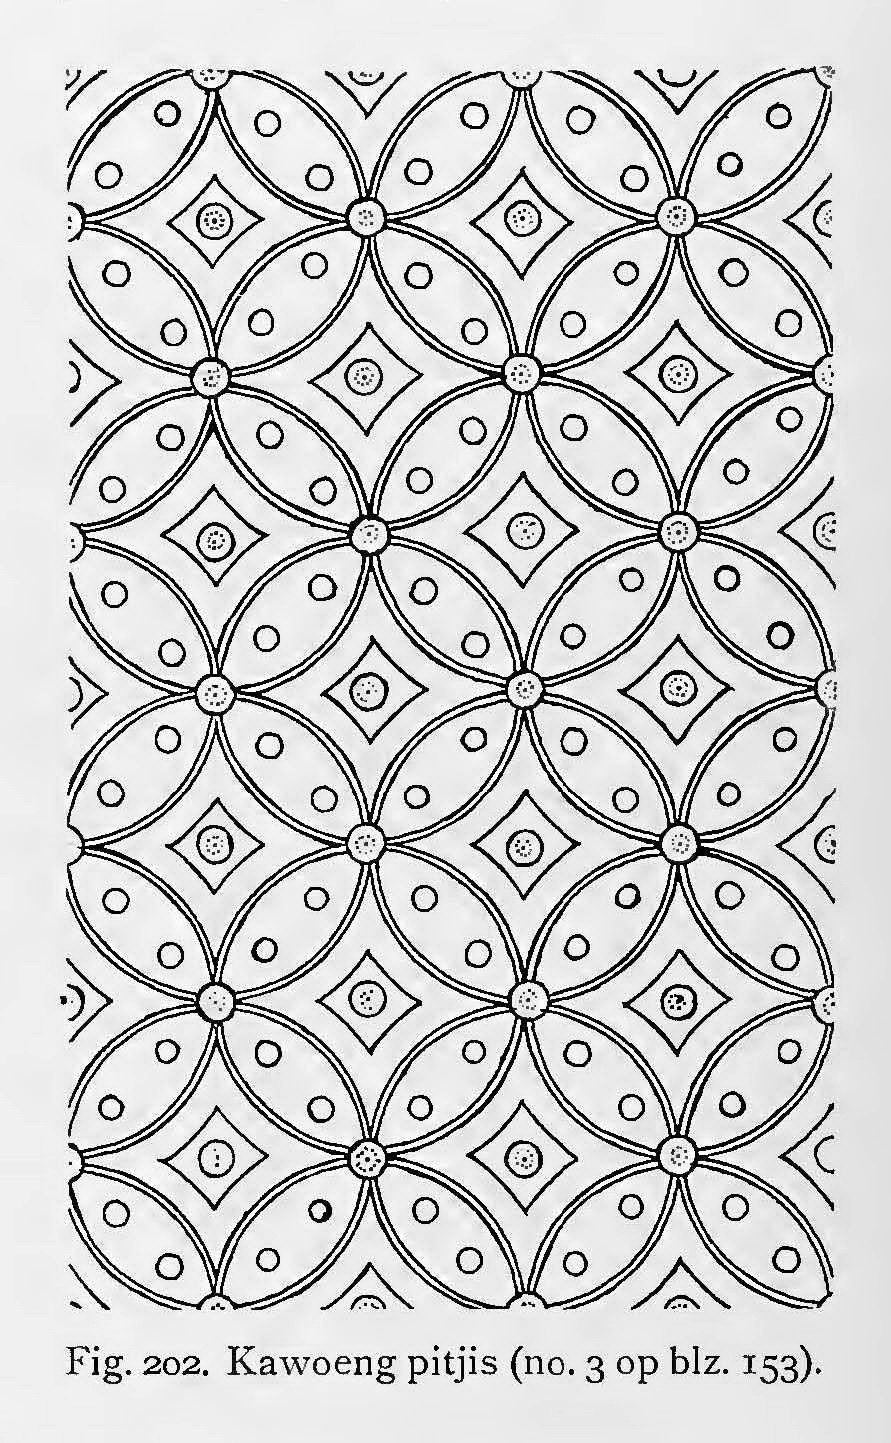 Motif Batik Sederhana Dan Mudah Digambar : motif, batik, sederhana, mudah, digambar, Mewarnai, Sketsa, Gambar, Batik, Sederhana, Terbaru, KataUcap